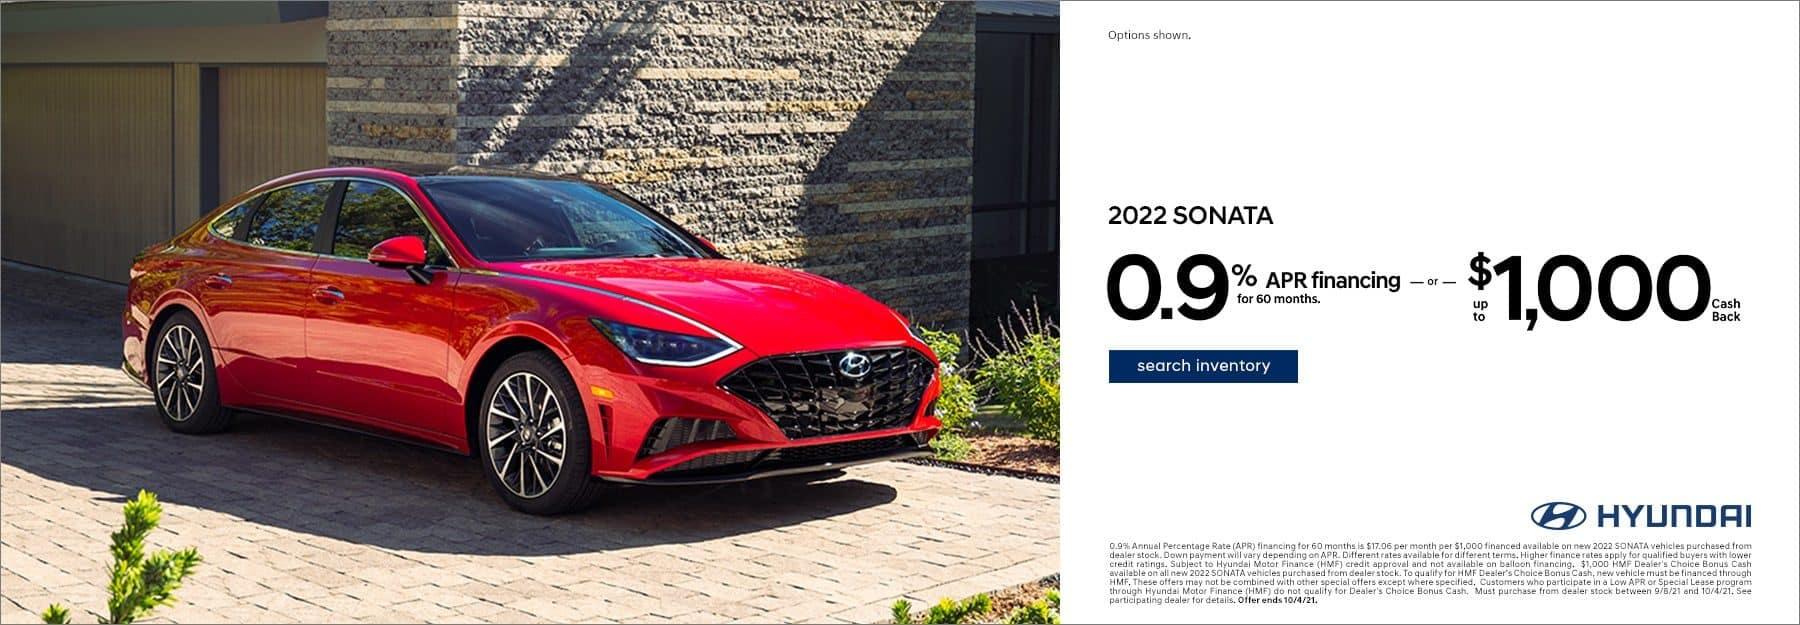 2022 Hyundai Sonata APR offer